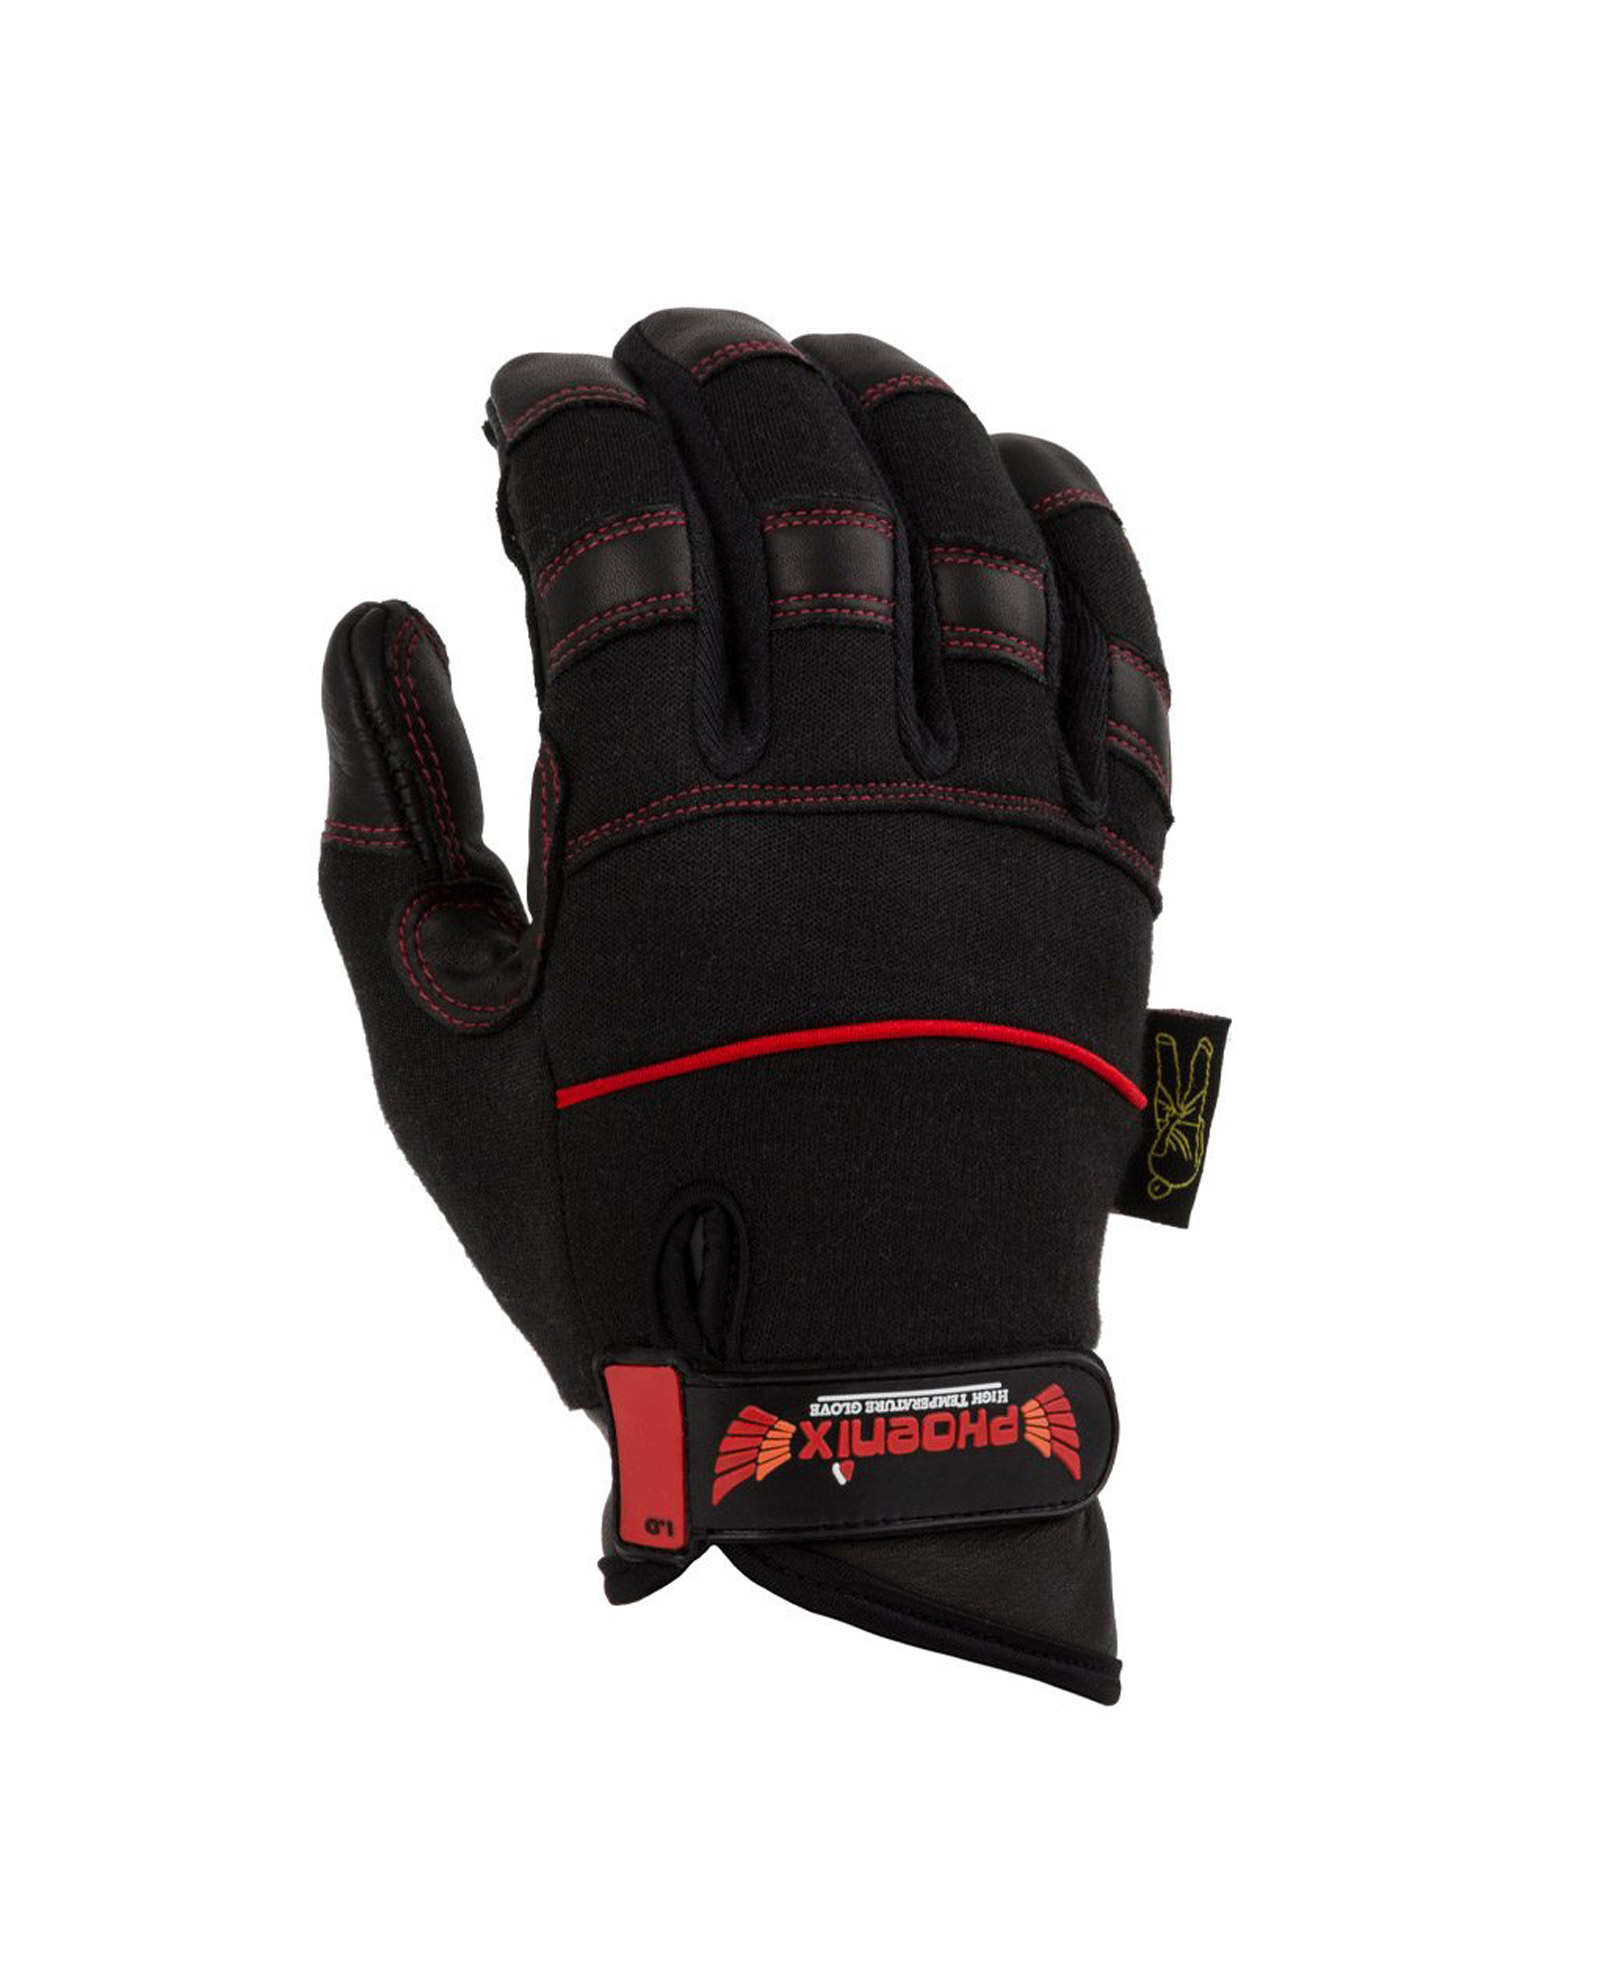 Dirty Rigger Glove Dty Phoenix Phoenix™ Heat Resistant Glove